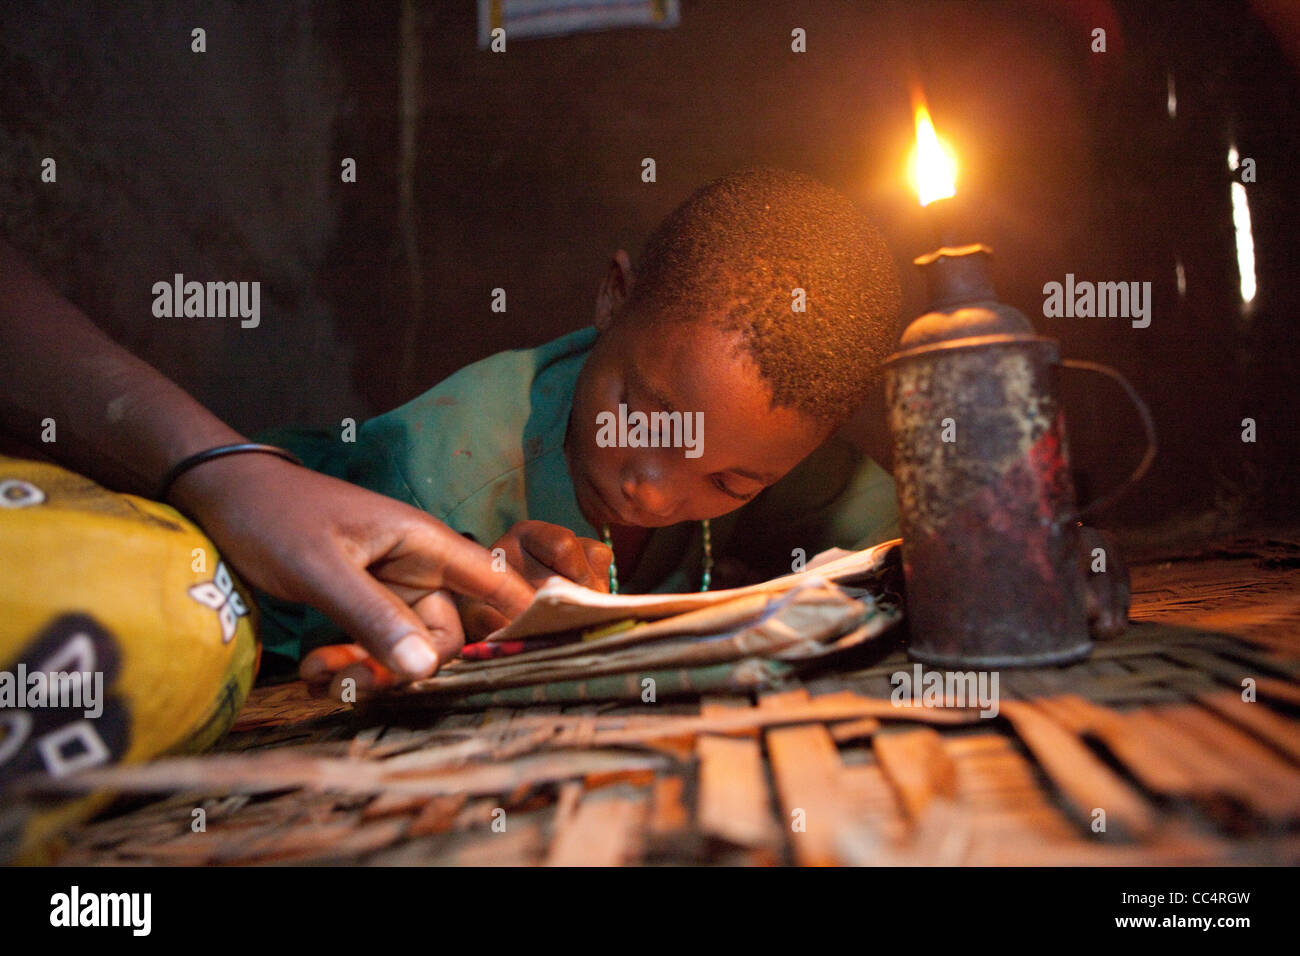 A student studies by the light of a kerosene lamp in Masaka, Uganda, East Africa. - Stock Image